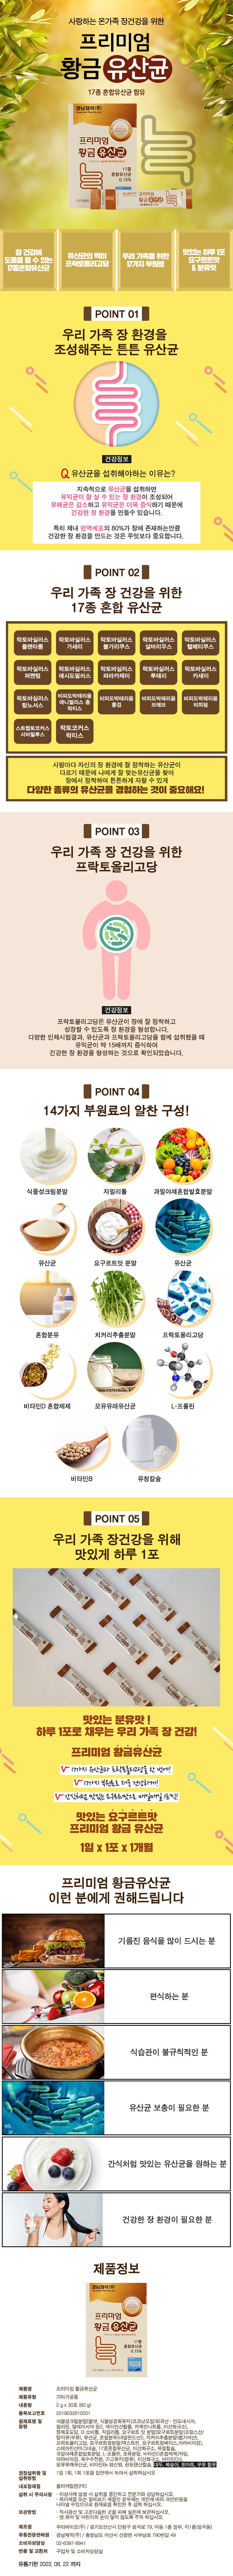 keongnamyoosan_page_30po.jpg